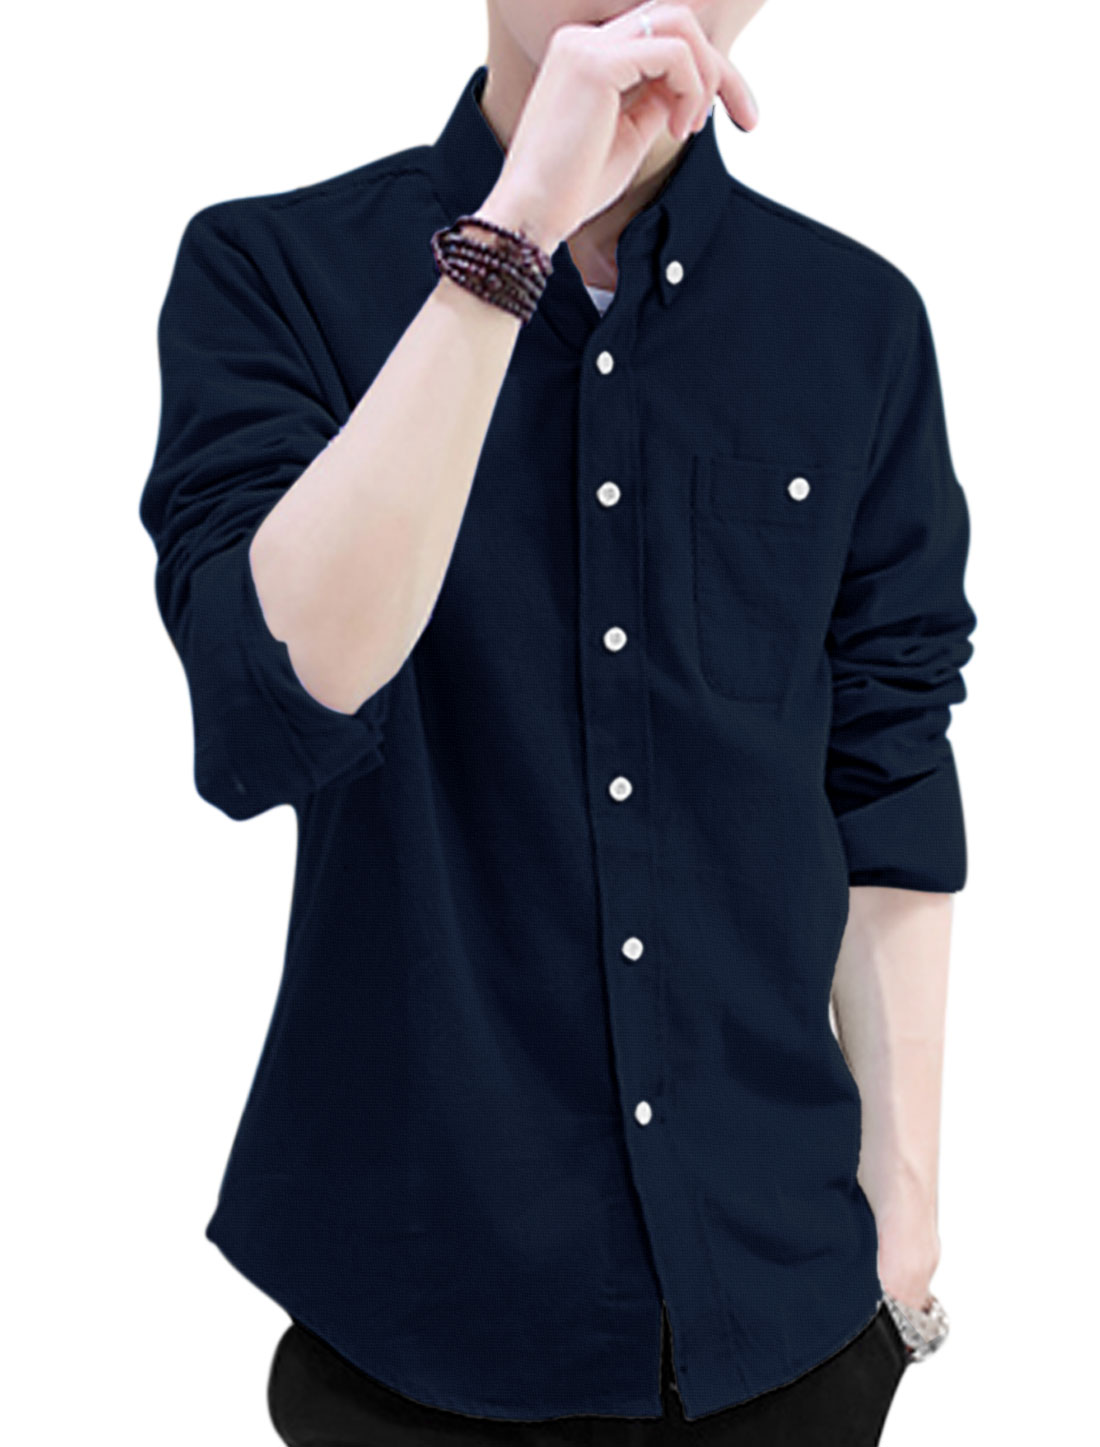 Men Point Collar One Pocket Chest Fashion Corduroy Shirt Navy Blue M